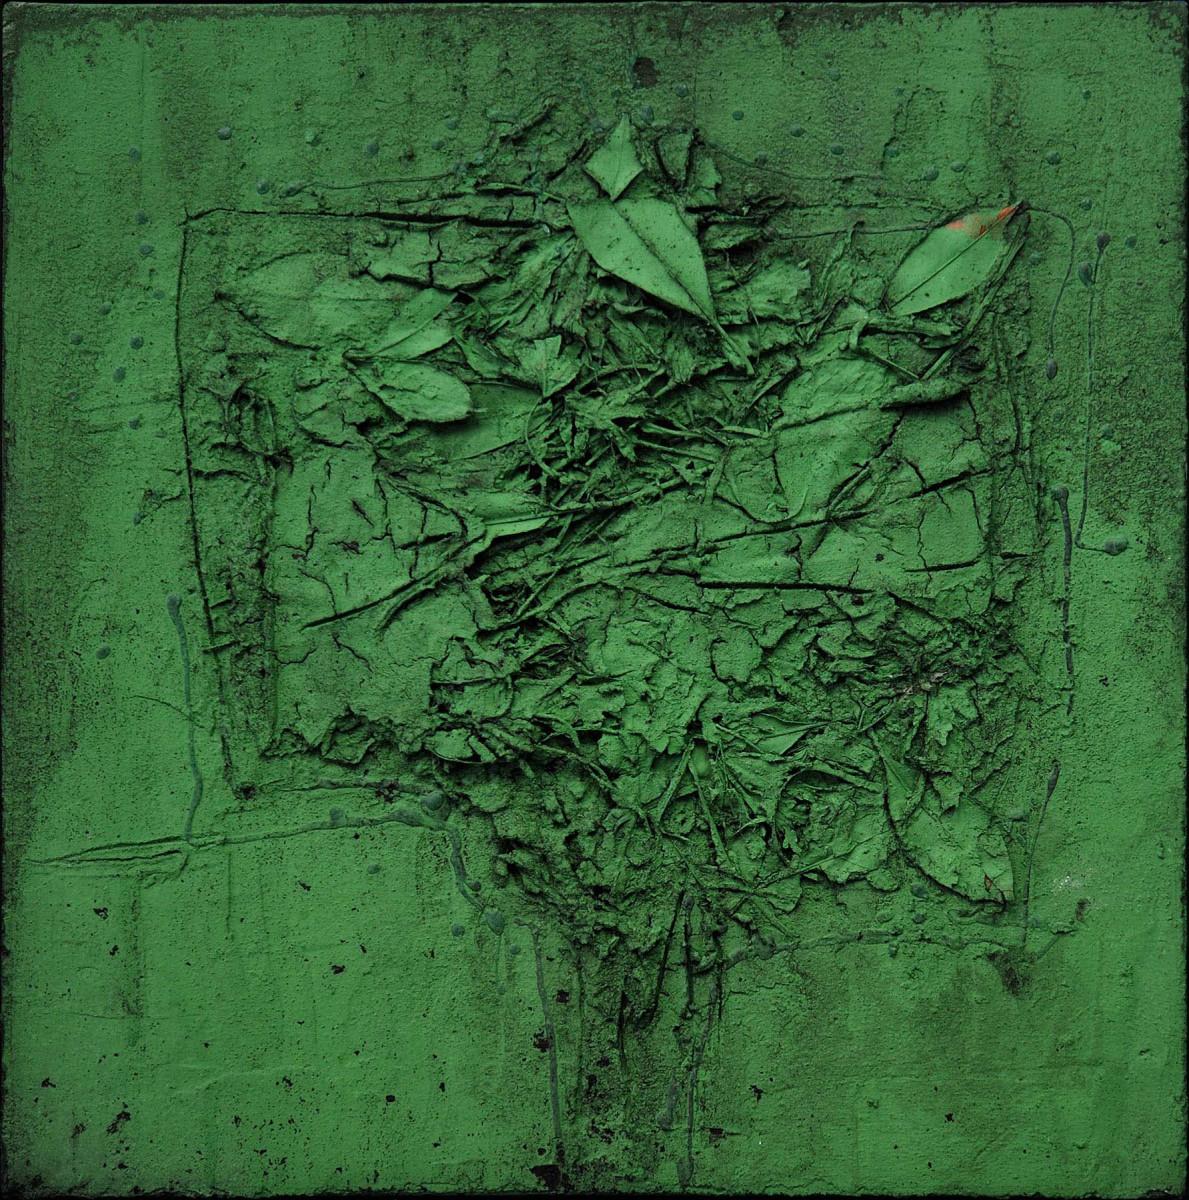 Terre-a-terre-acryle-beton-vegetaux-40-x-40-cm-2018